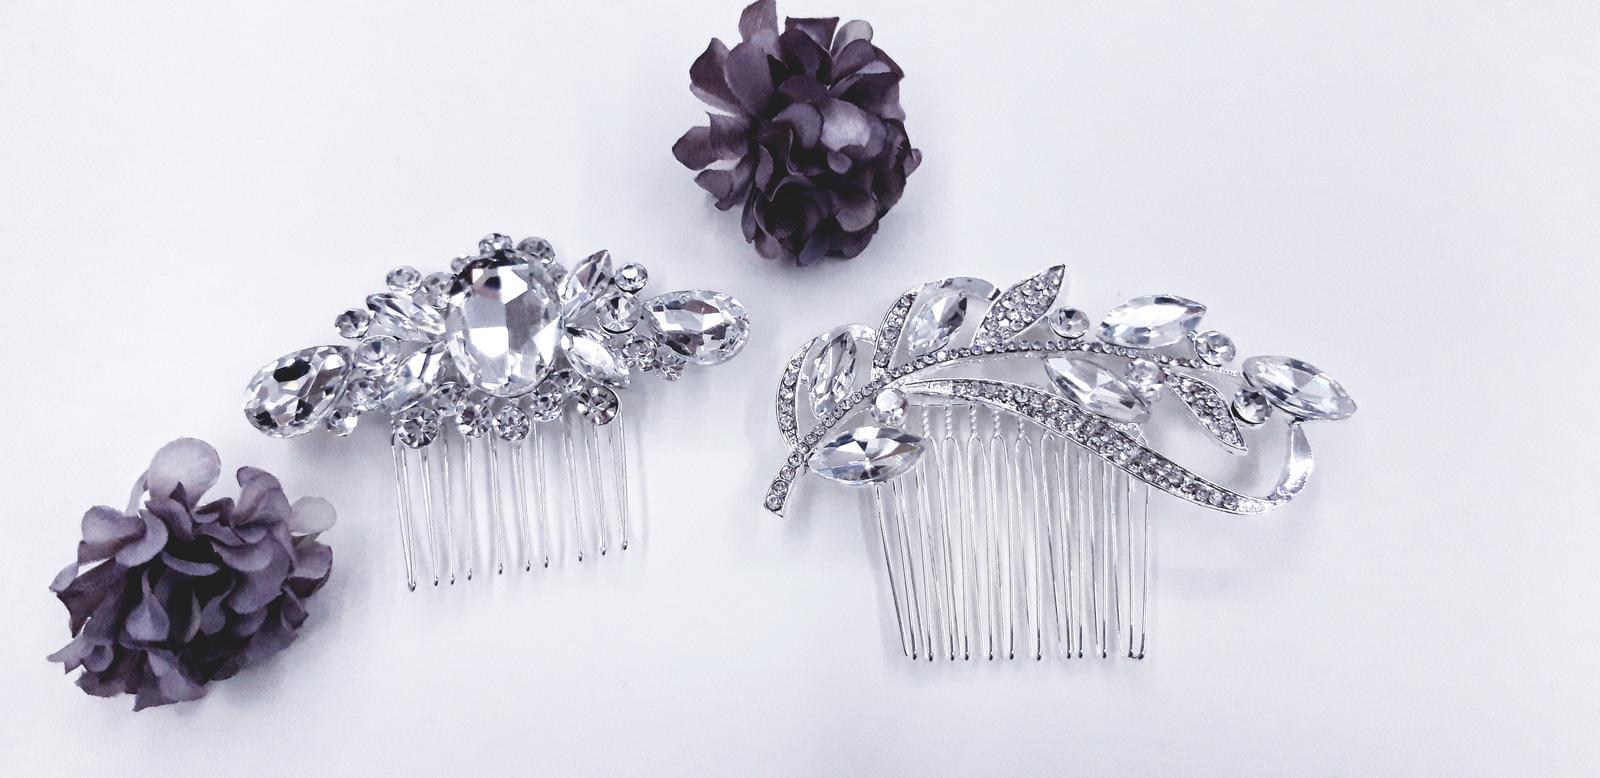 M∞P wedding ideas - hrebene do vlasov